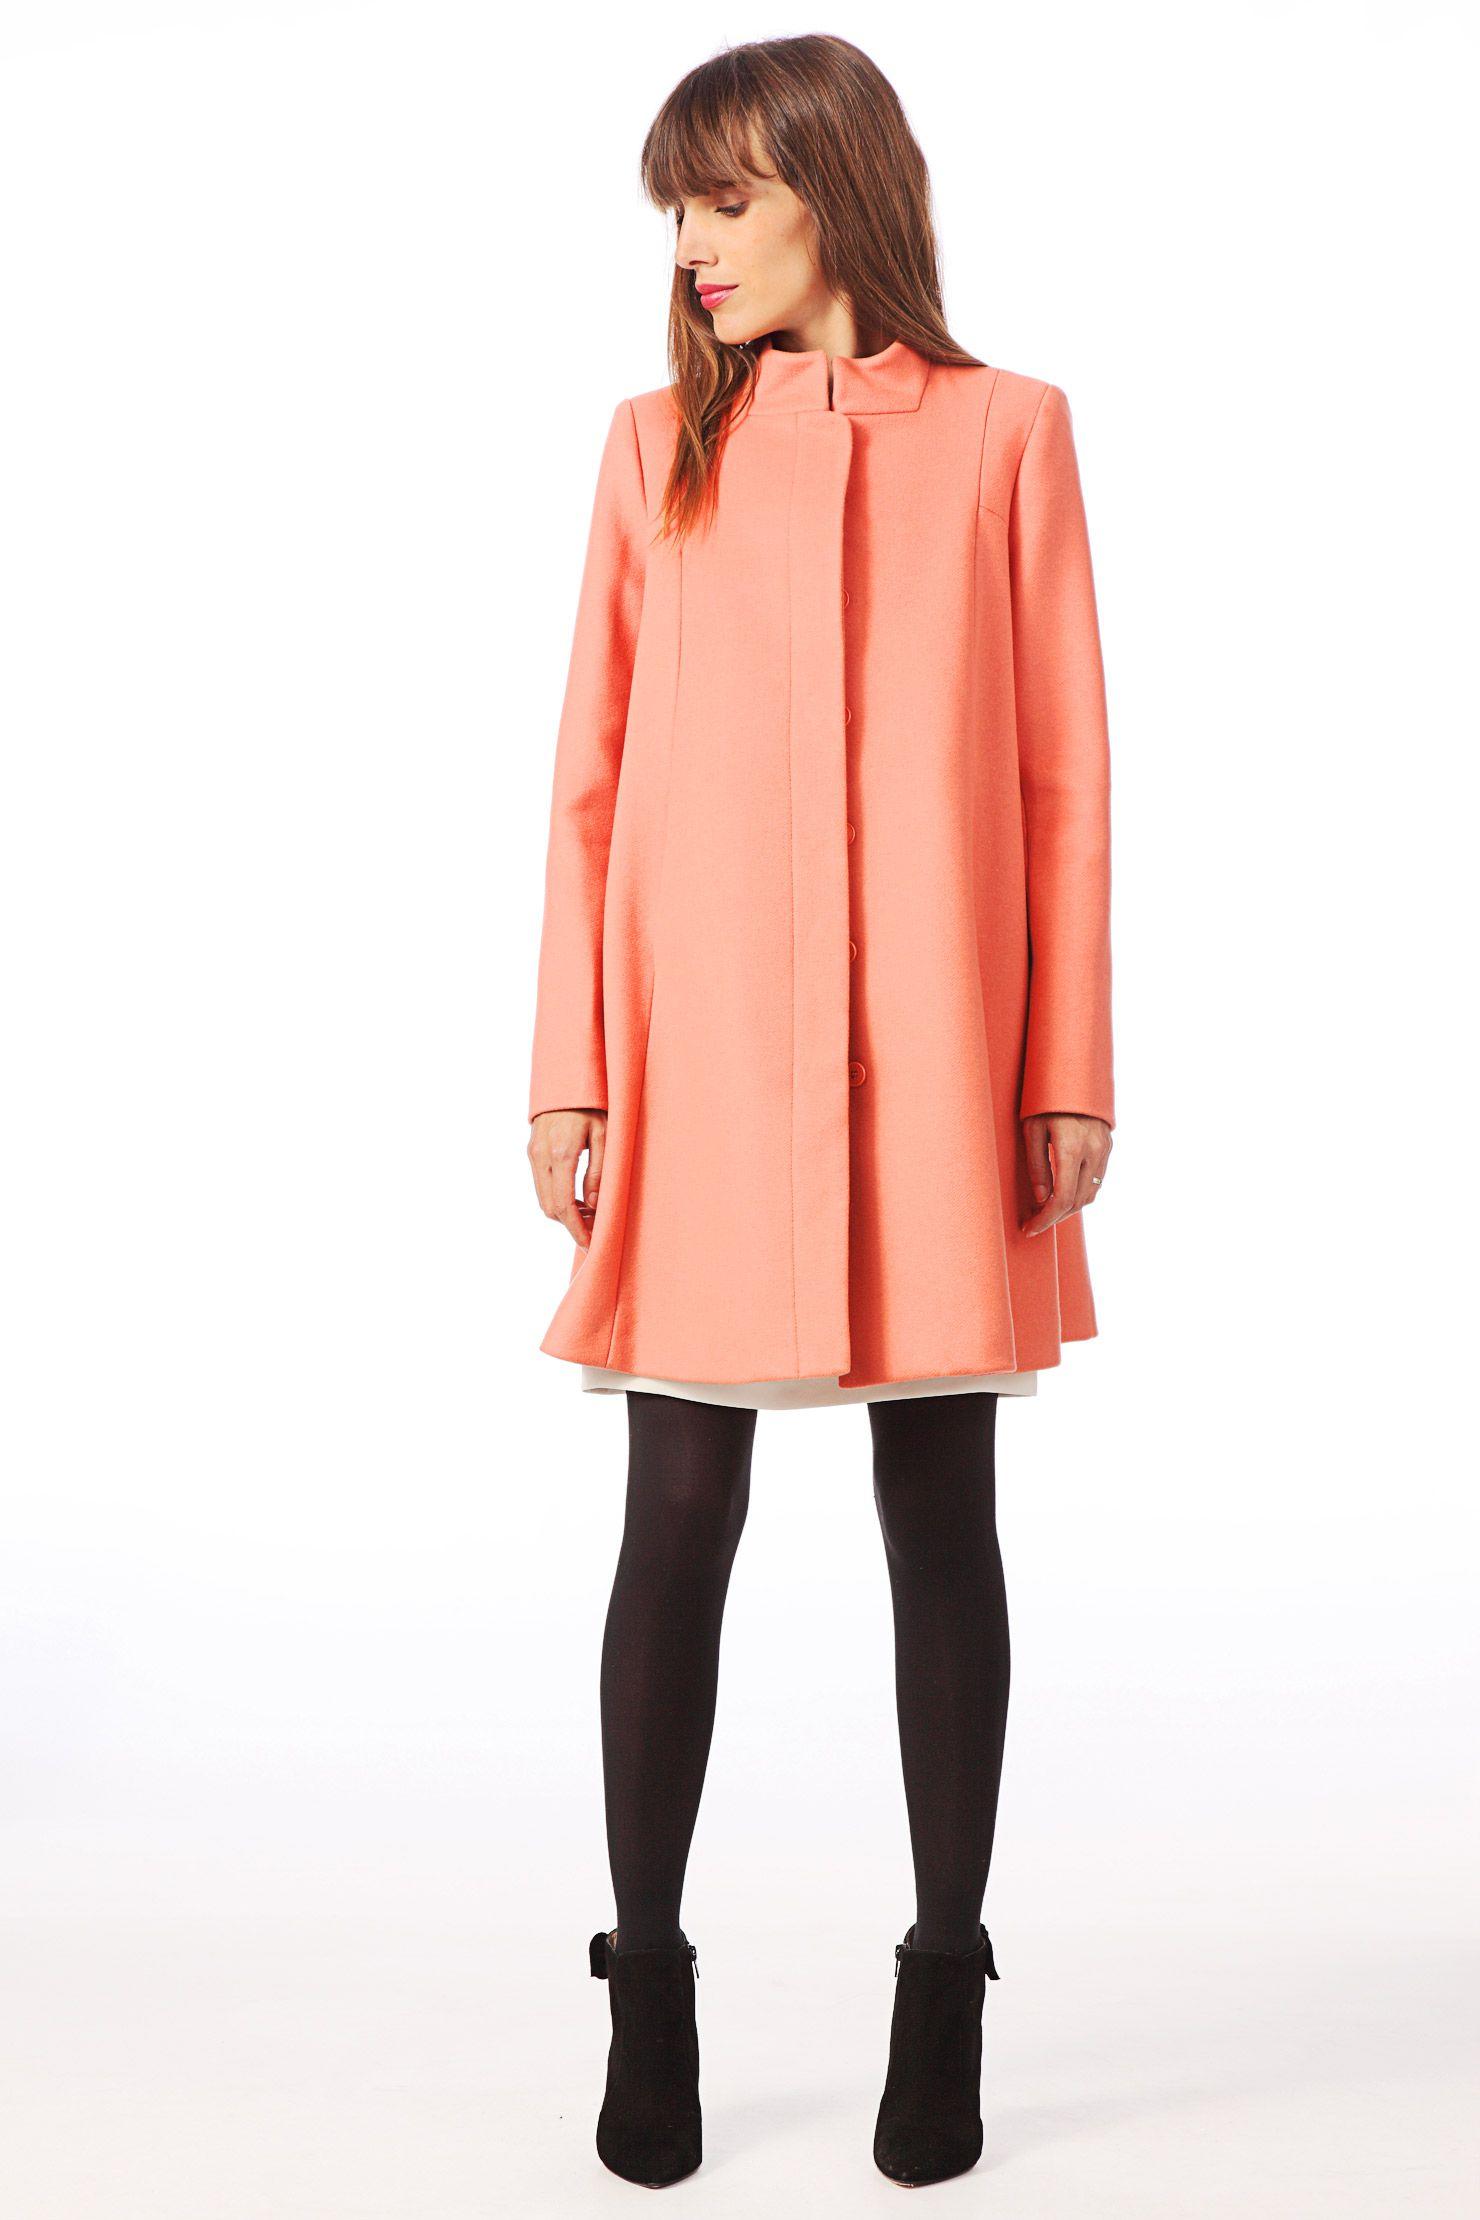 0f9b10135096 Manteau femme - Corail - TARA JARMON - Mode   Women s Fashion ...